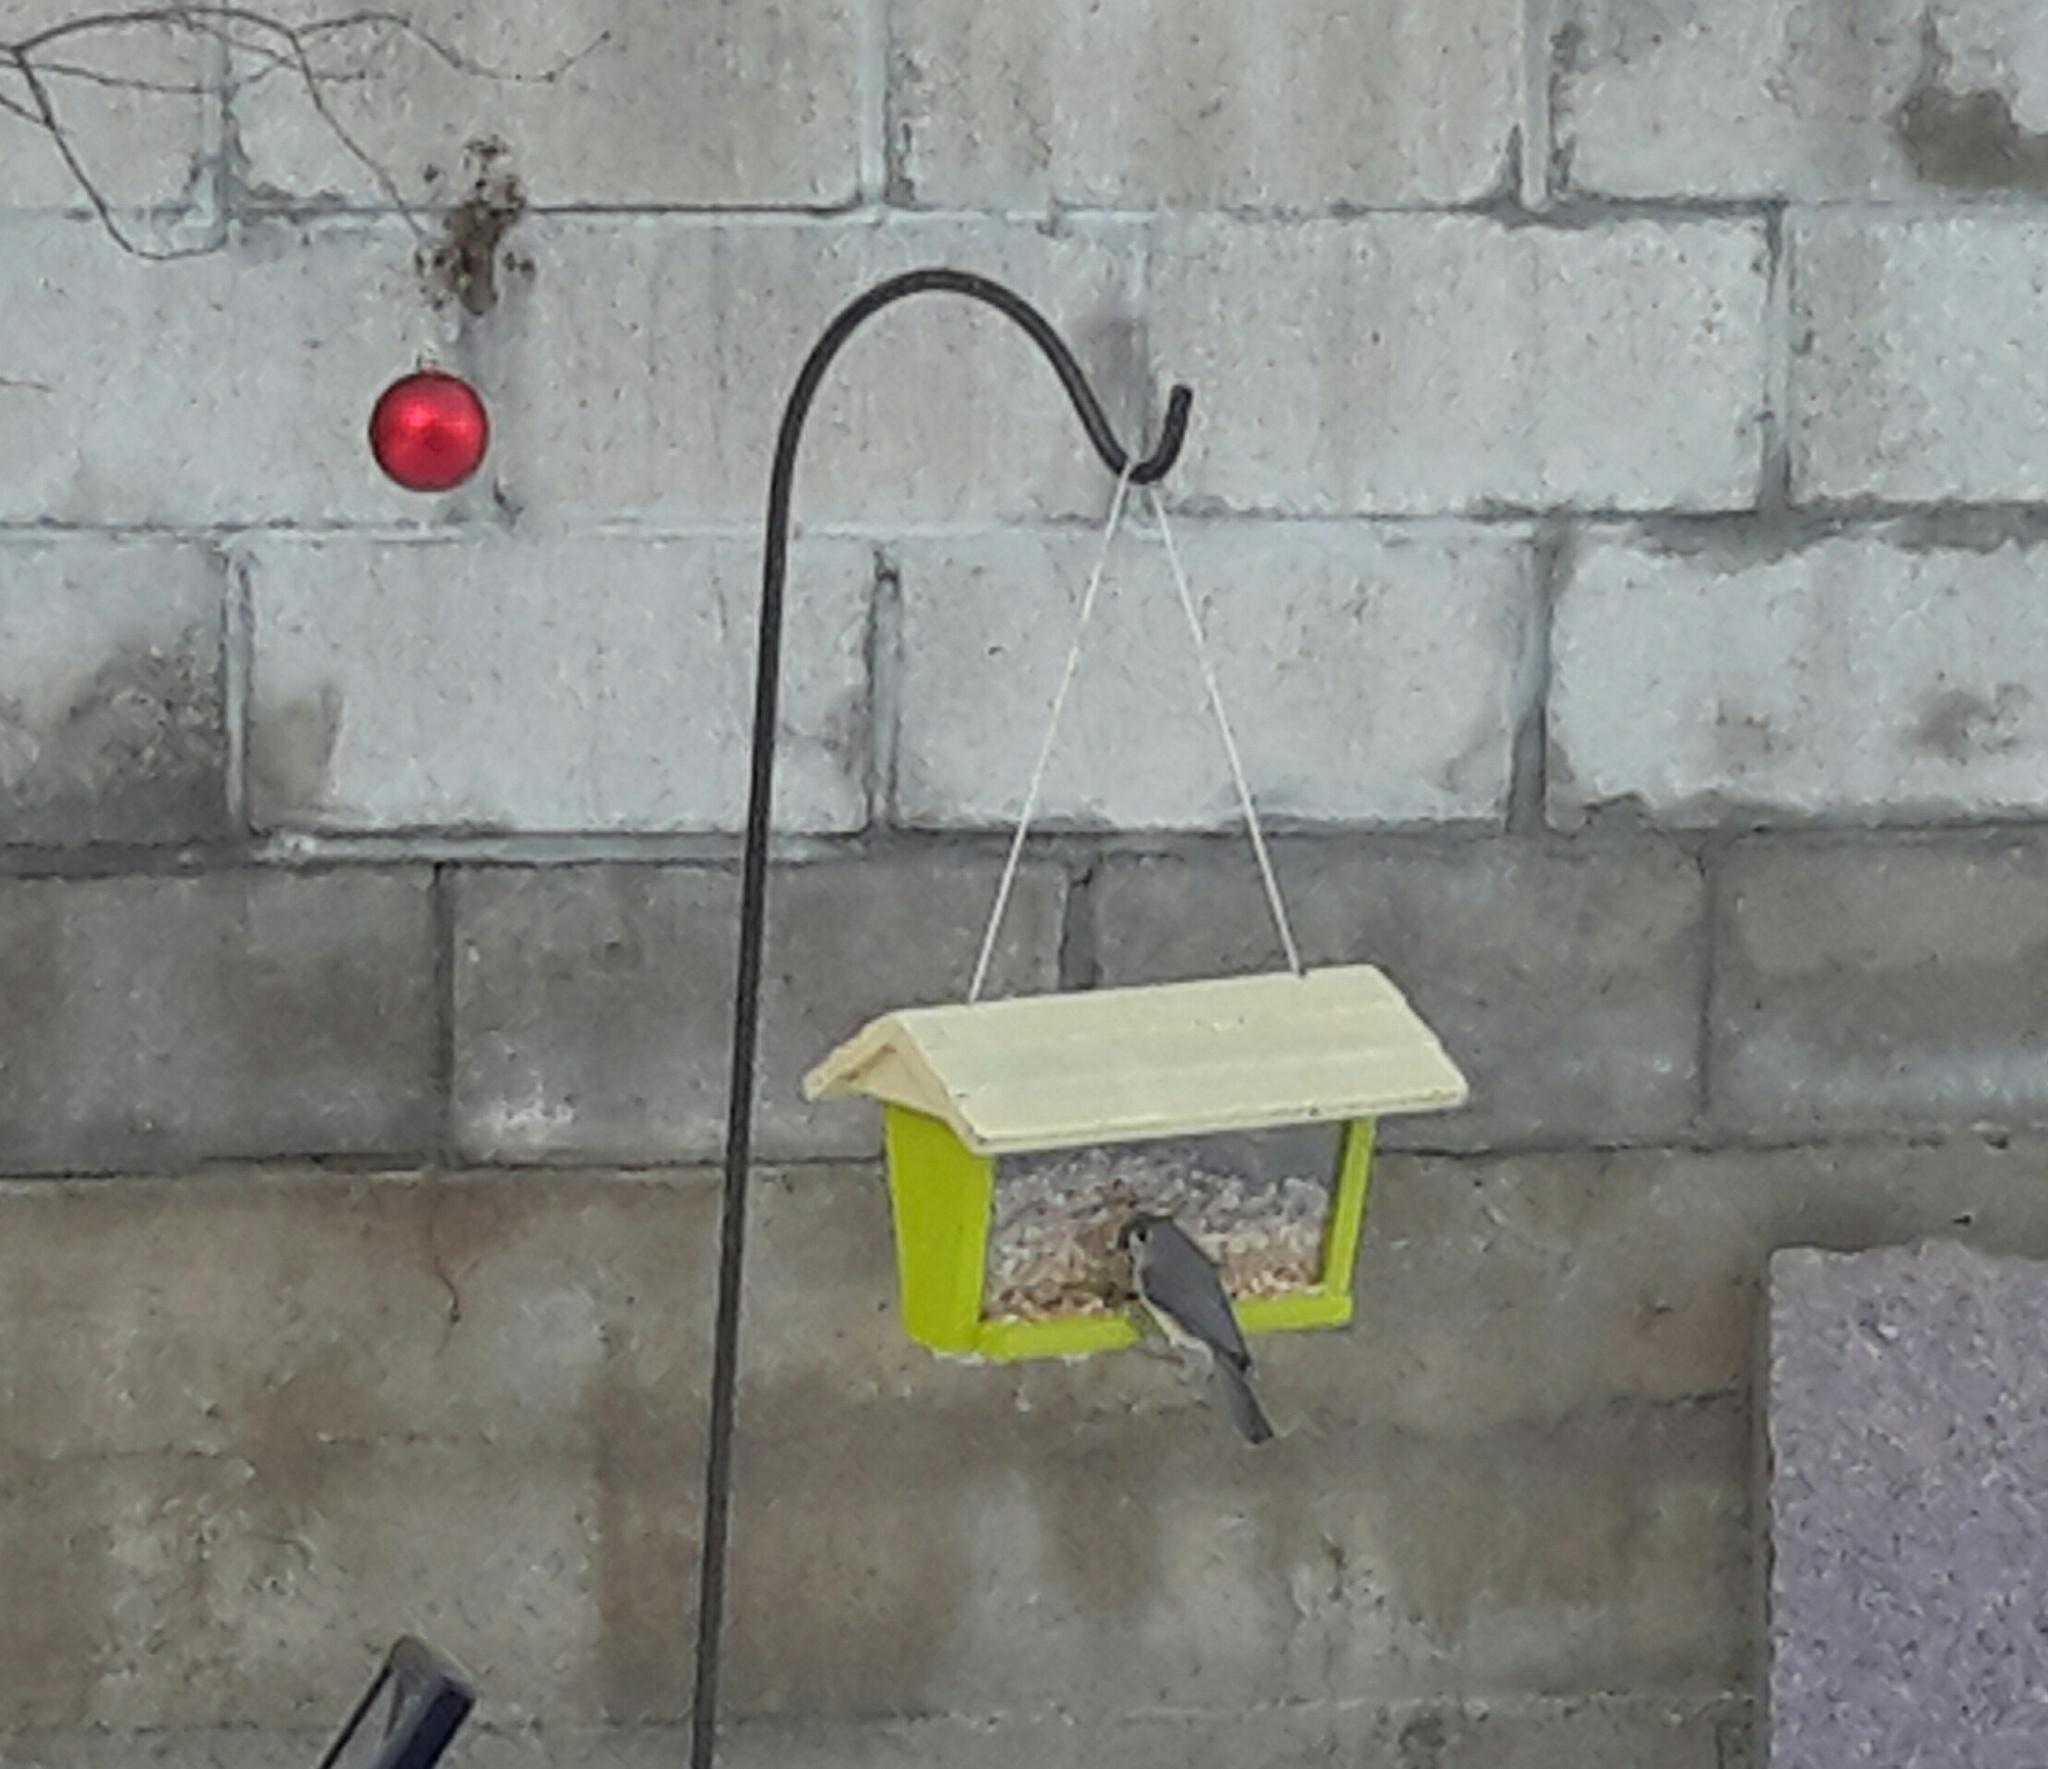 Bird on the feeder by Karen McDonald